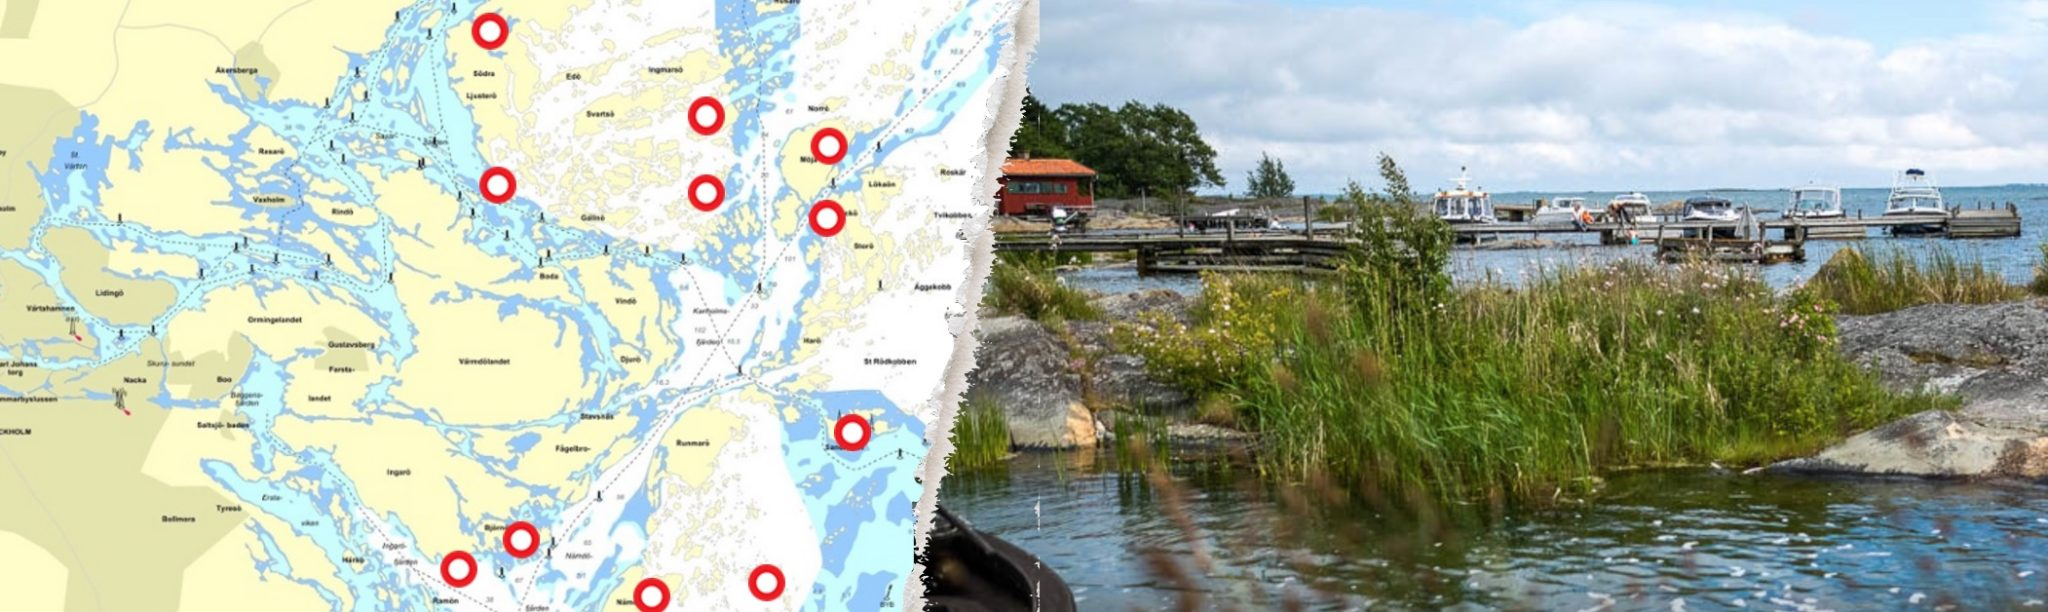 archipelago-map-rivkant.jpg